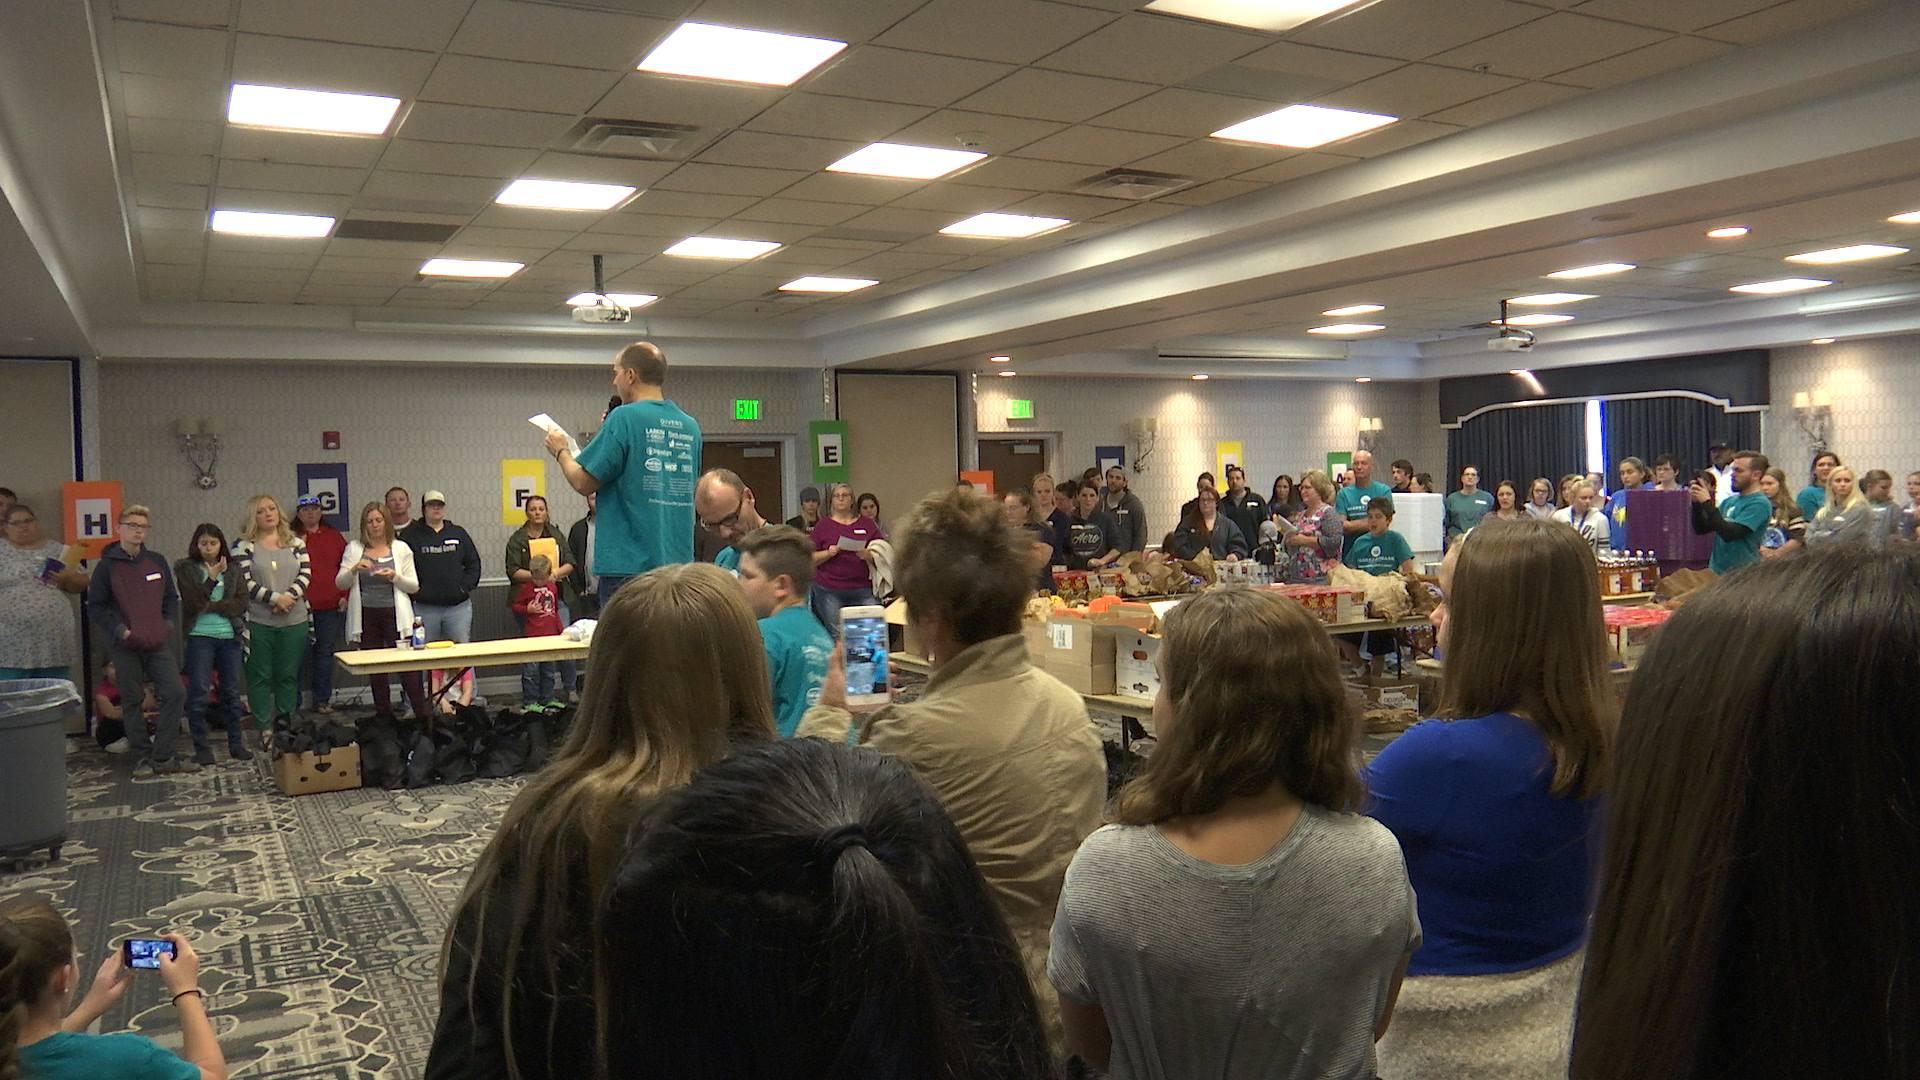 Basket Brigade organizer Jeremy Larkin, standing in blue shirt, addresses volunteers before the Basket Brigade starts assembling food baskets. St. George, Utah, Nov. 19, 2016 | Photo by Sheldon Demke, St. George News